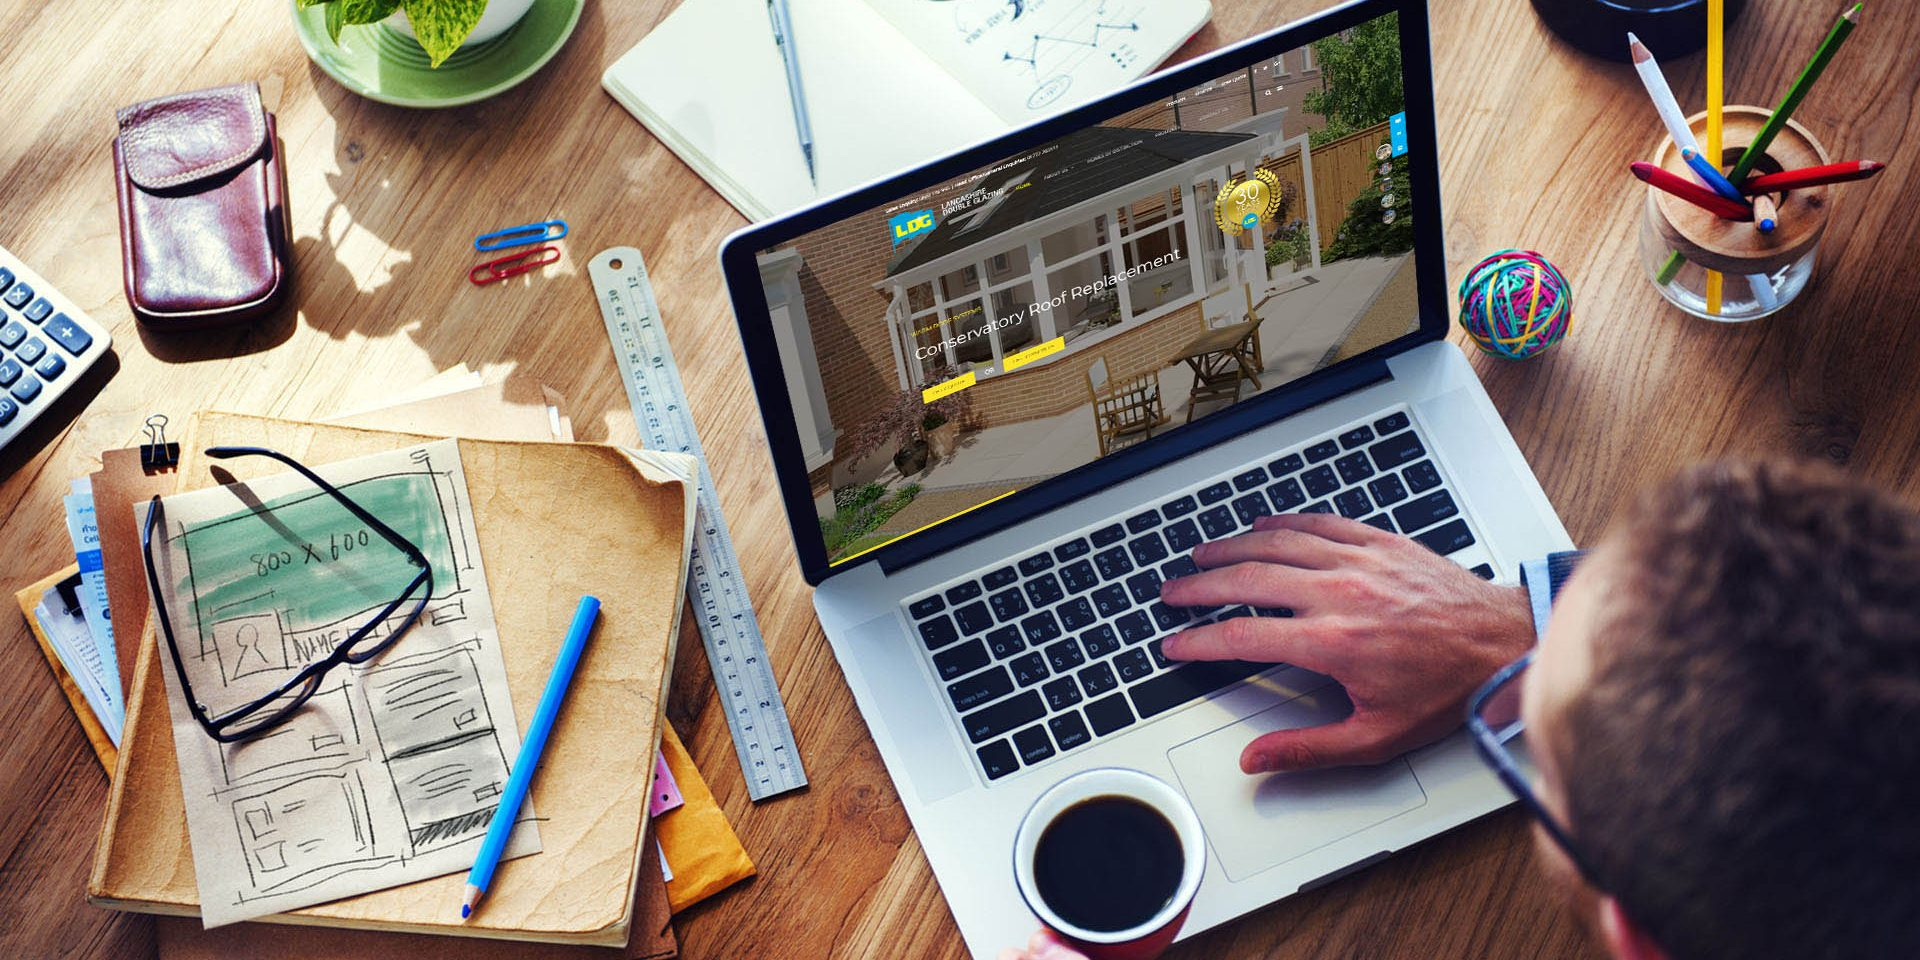 lancashire-double-glazing-website-development